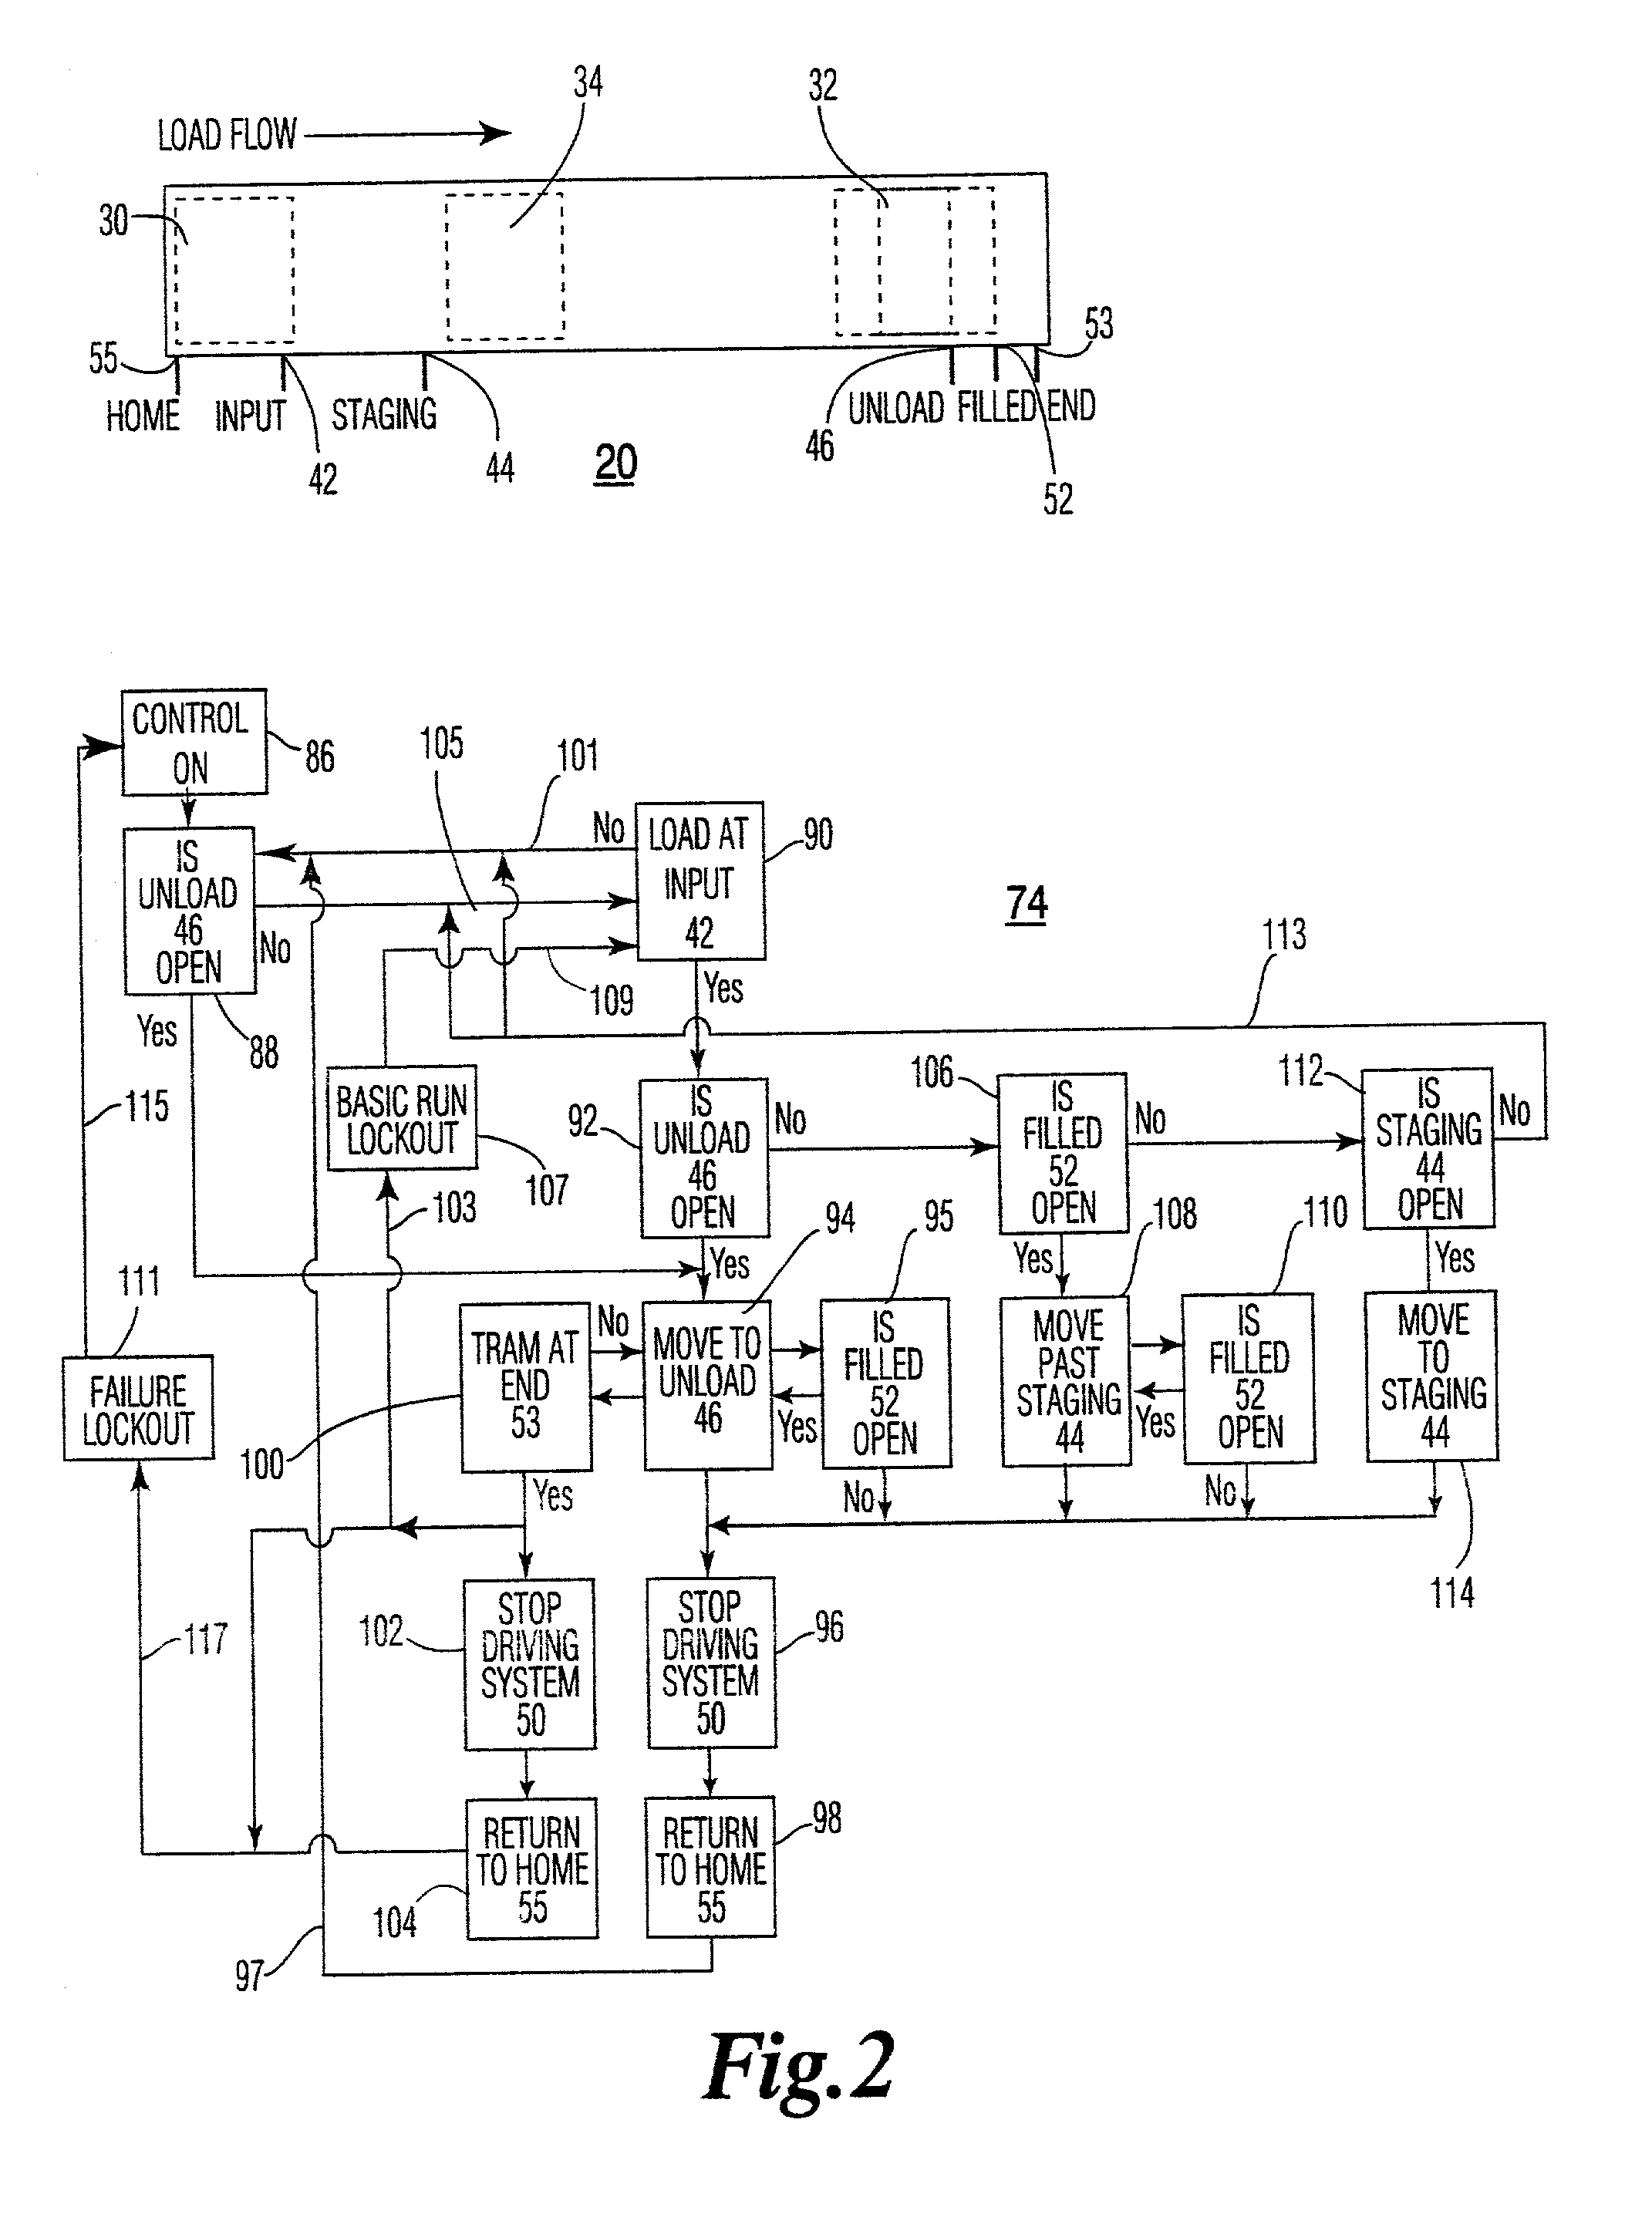 Tremendous Conveyor System Wiring Diagram Wiring Library Wiring Digital Resources Timewpwclawcorpcom